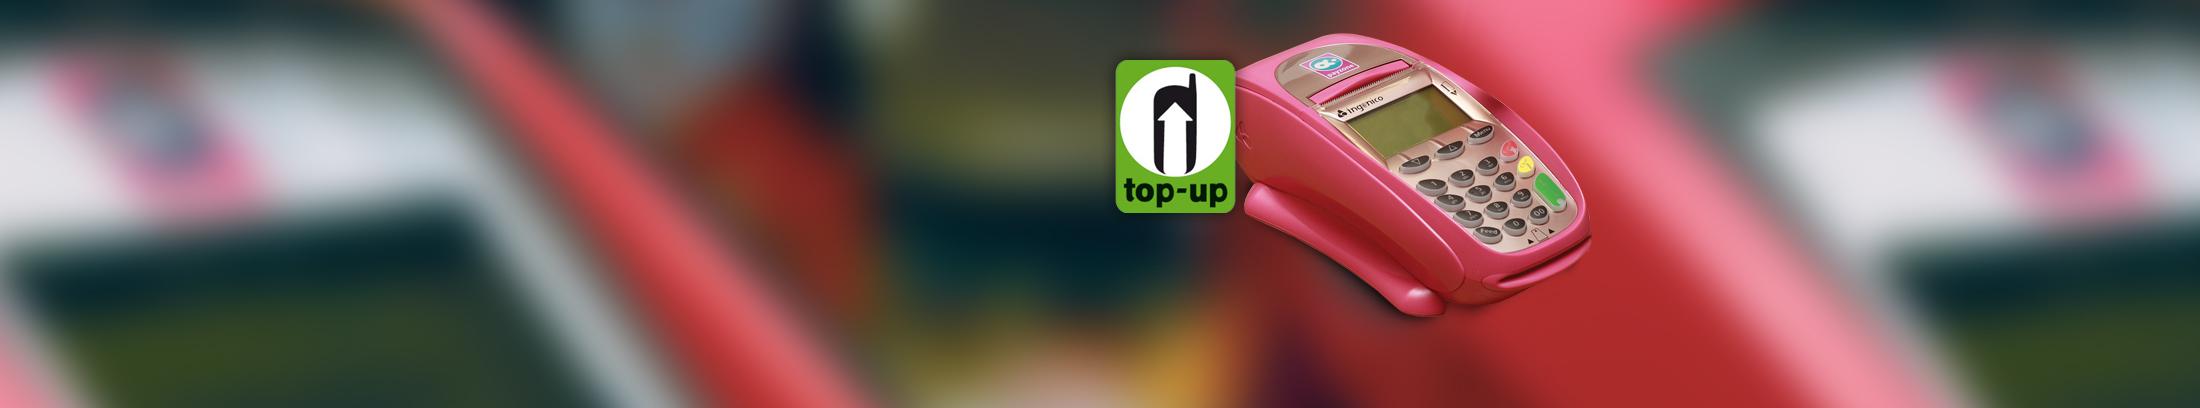 etop-up